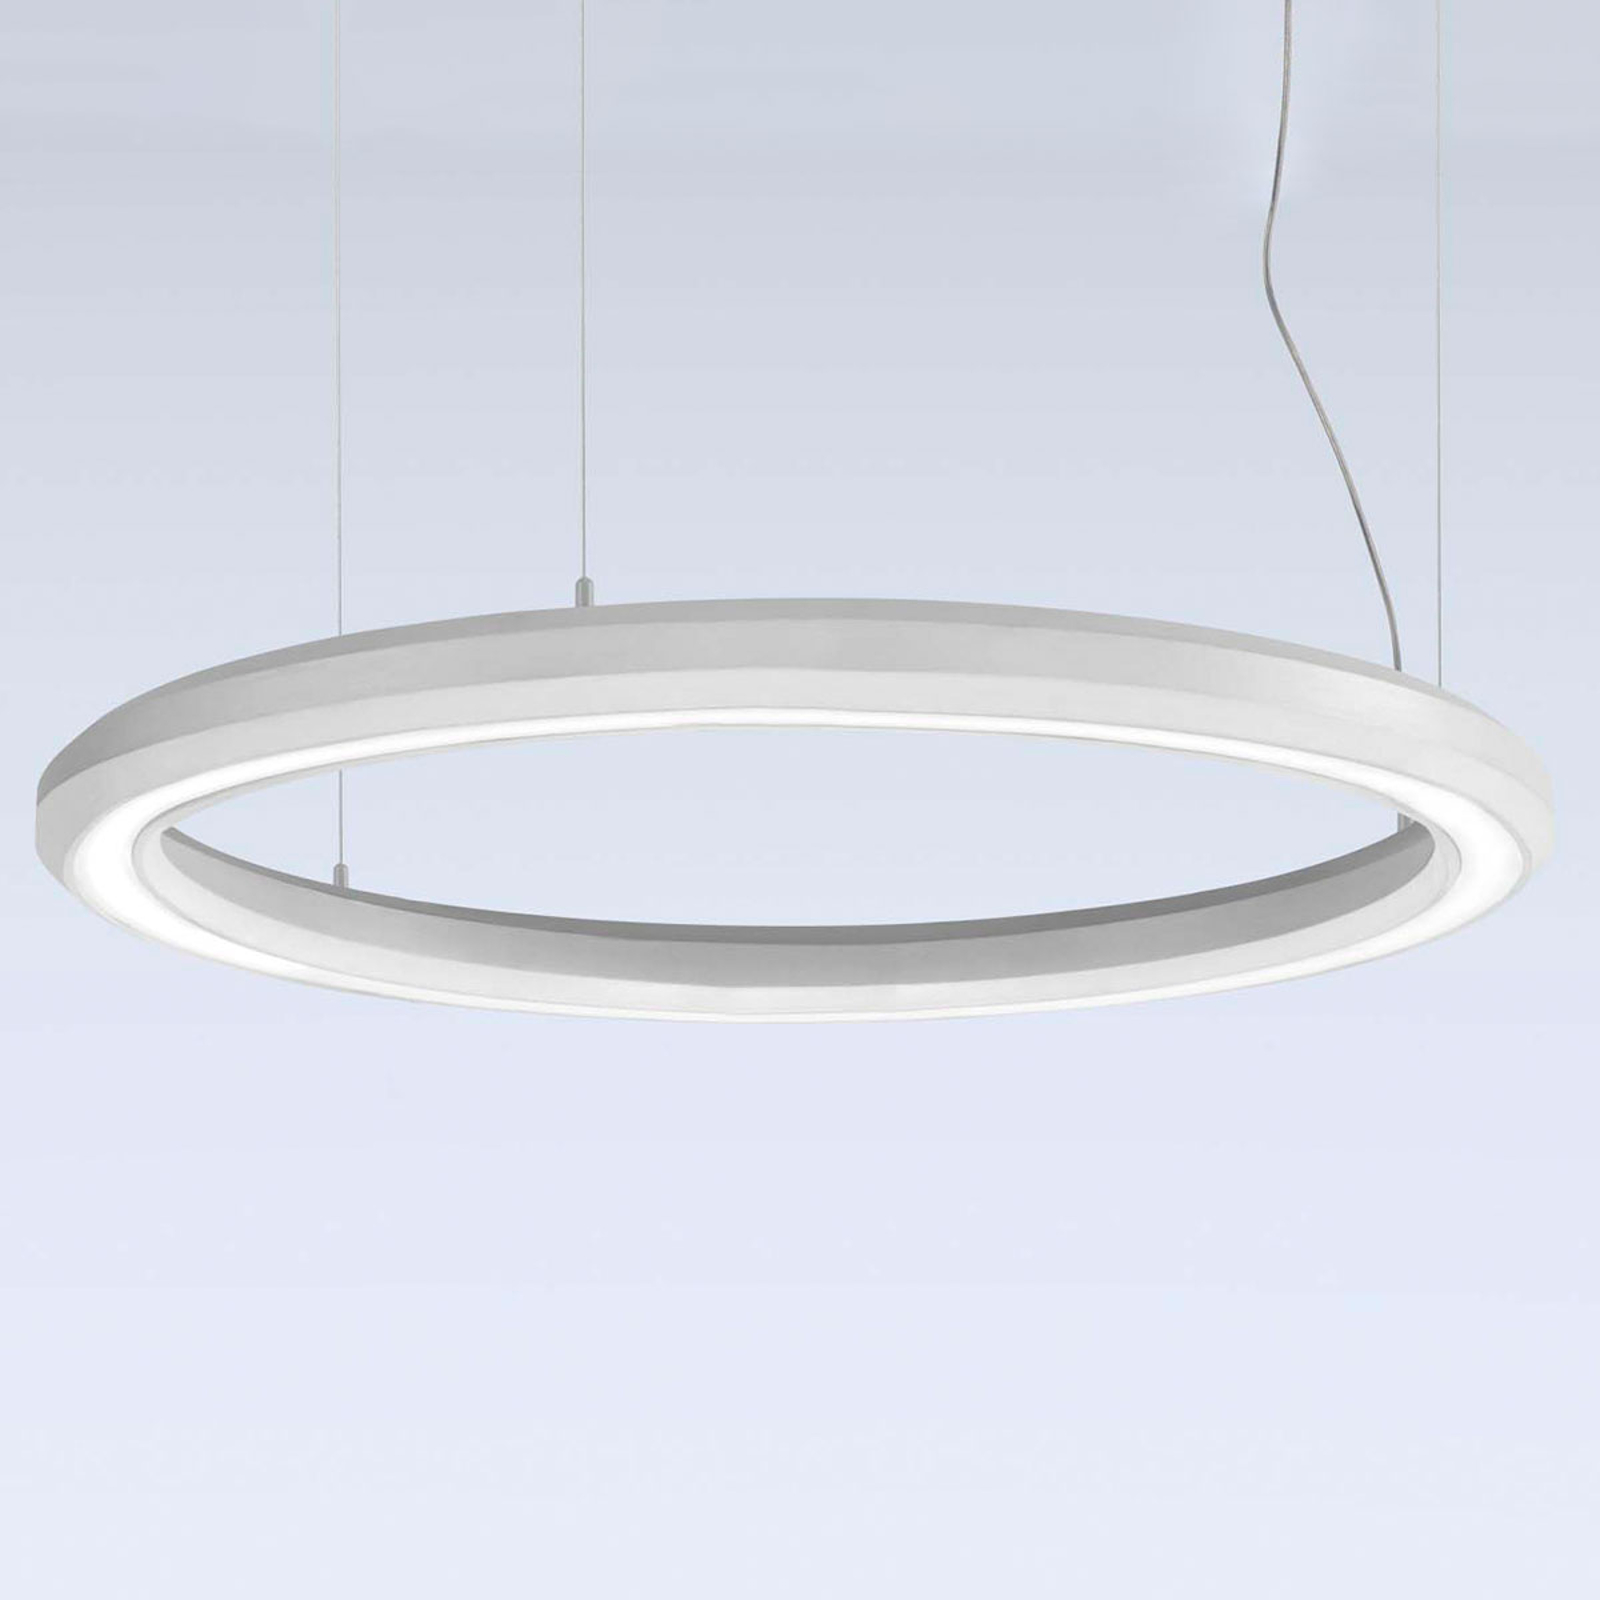 LED hanglamp Materica onder Ø 90 cm wit